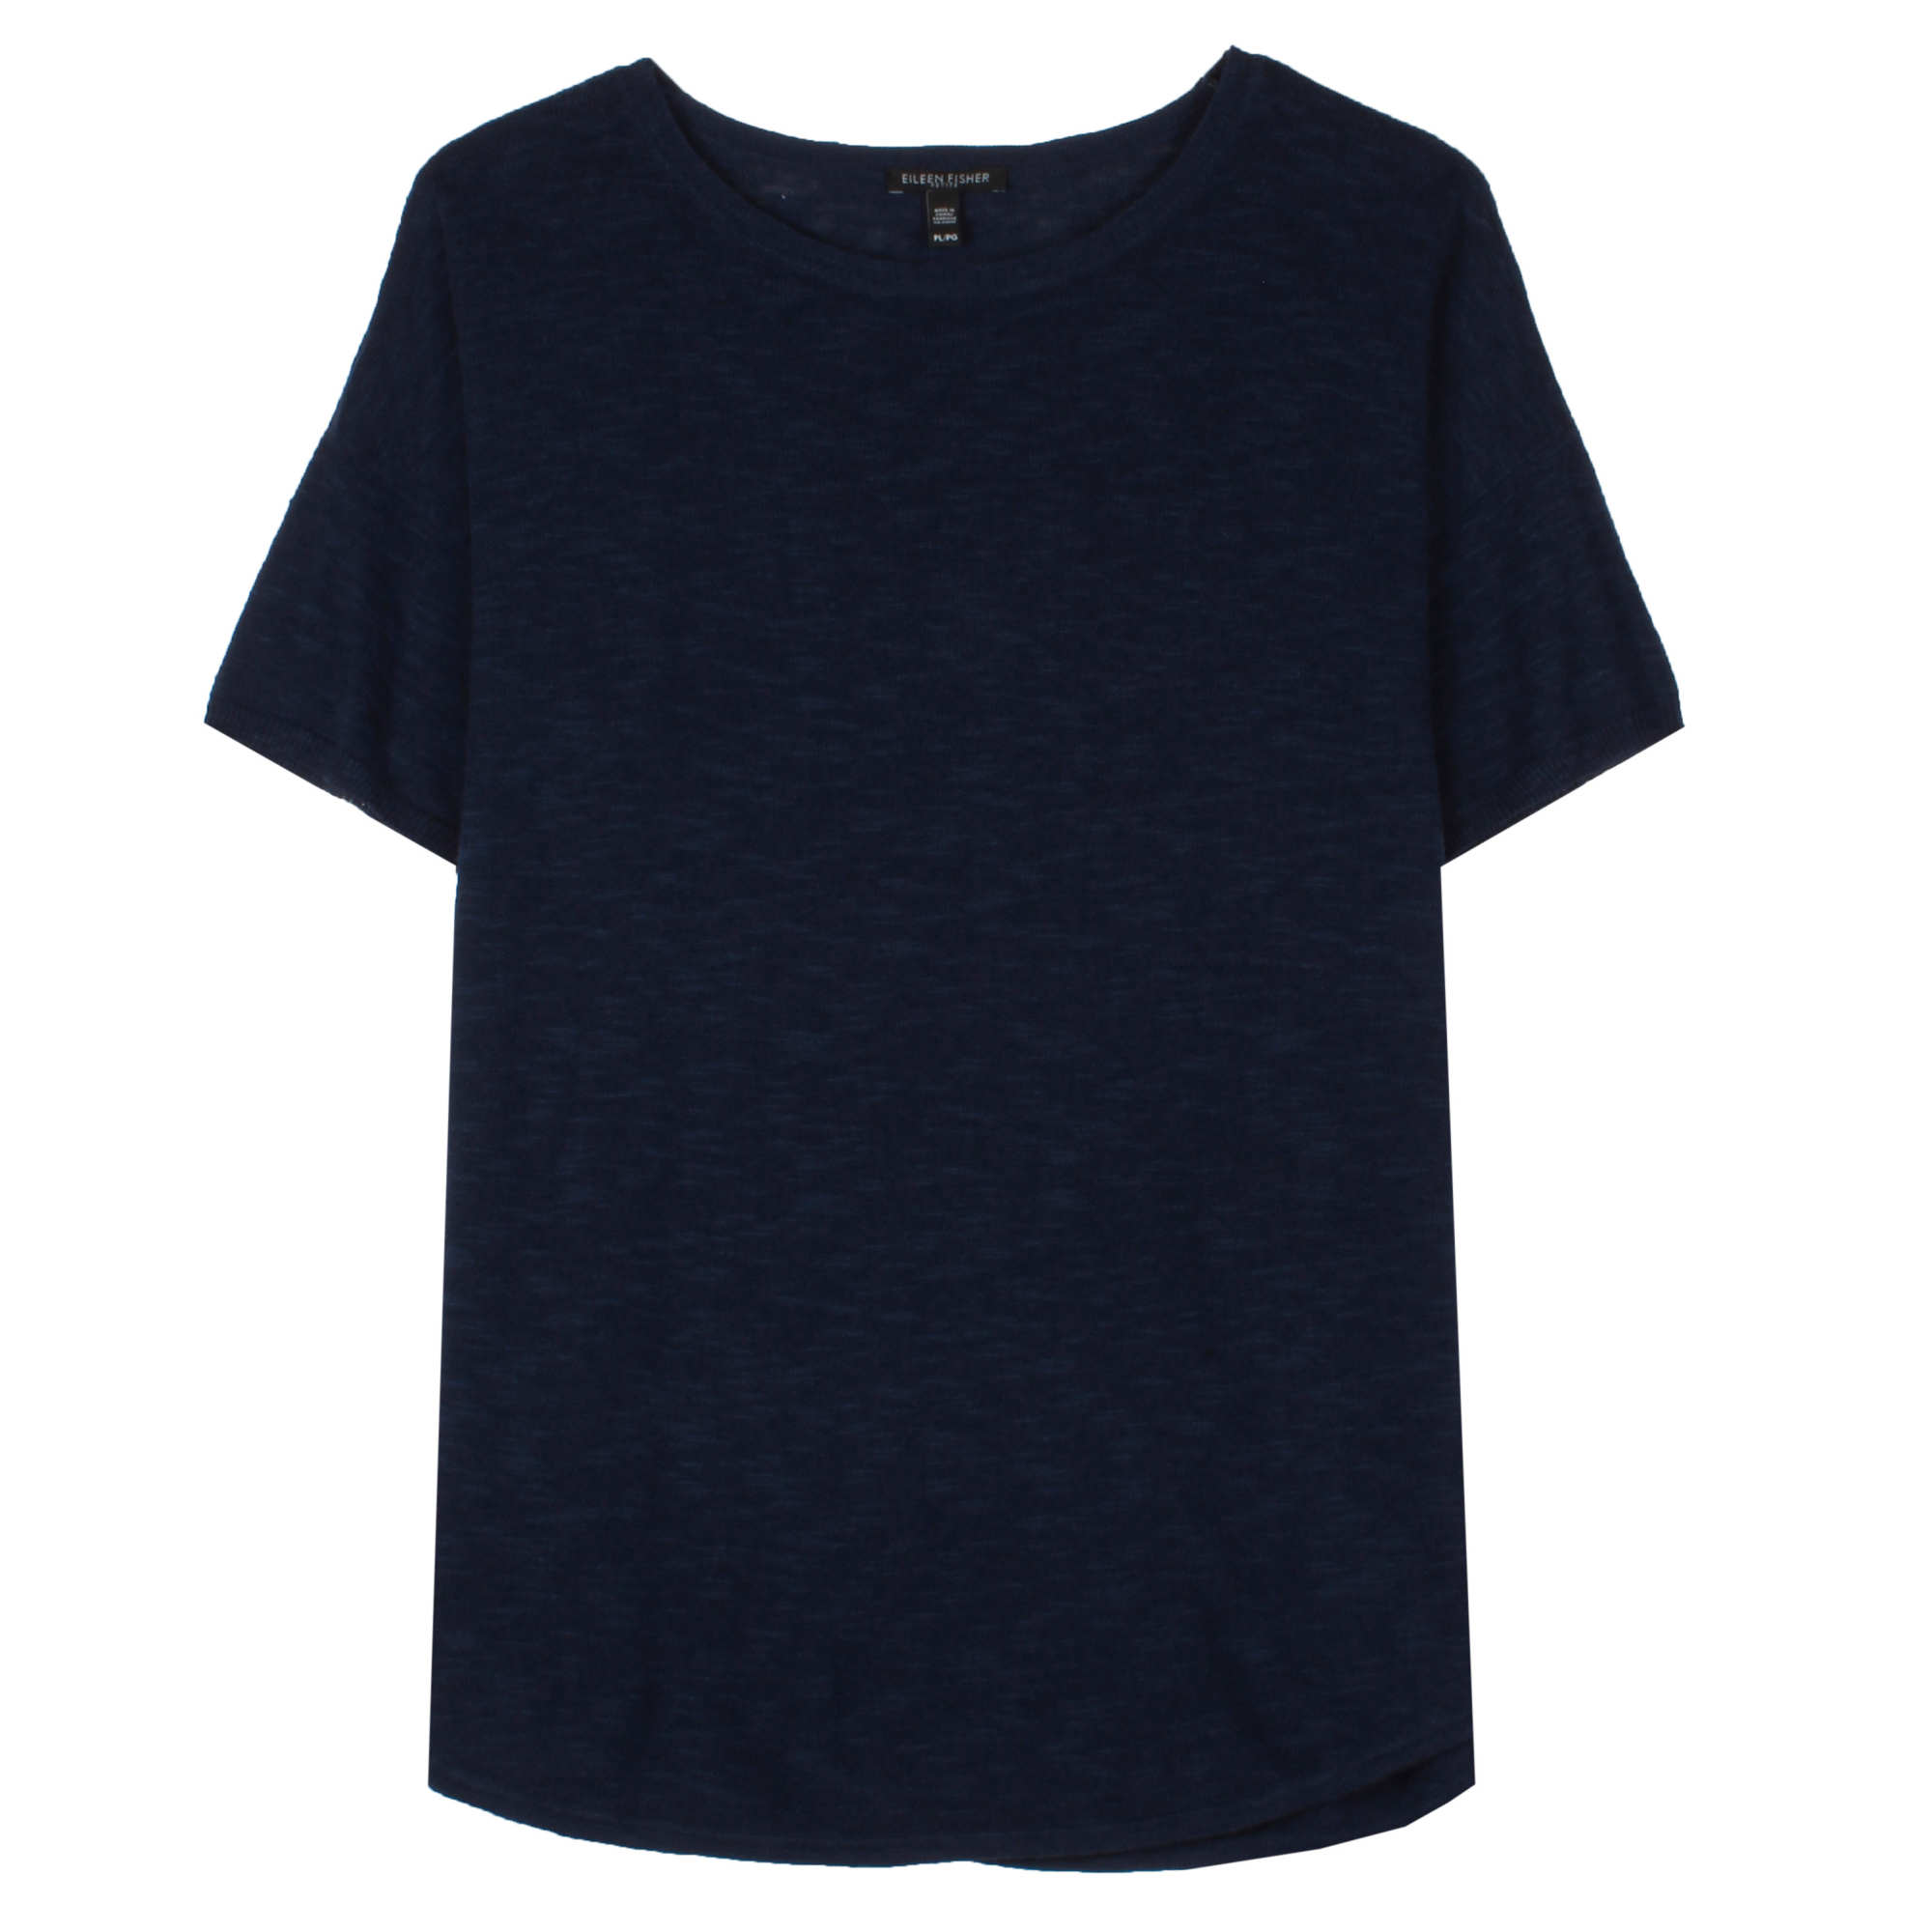 Organic Linen Cotton Slub Pullover